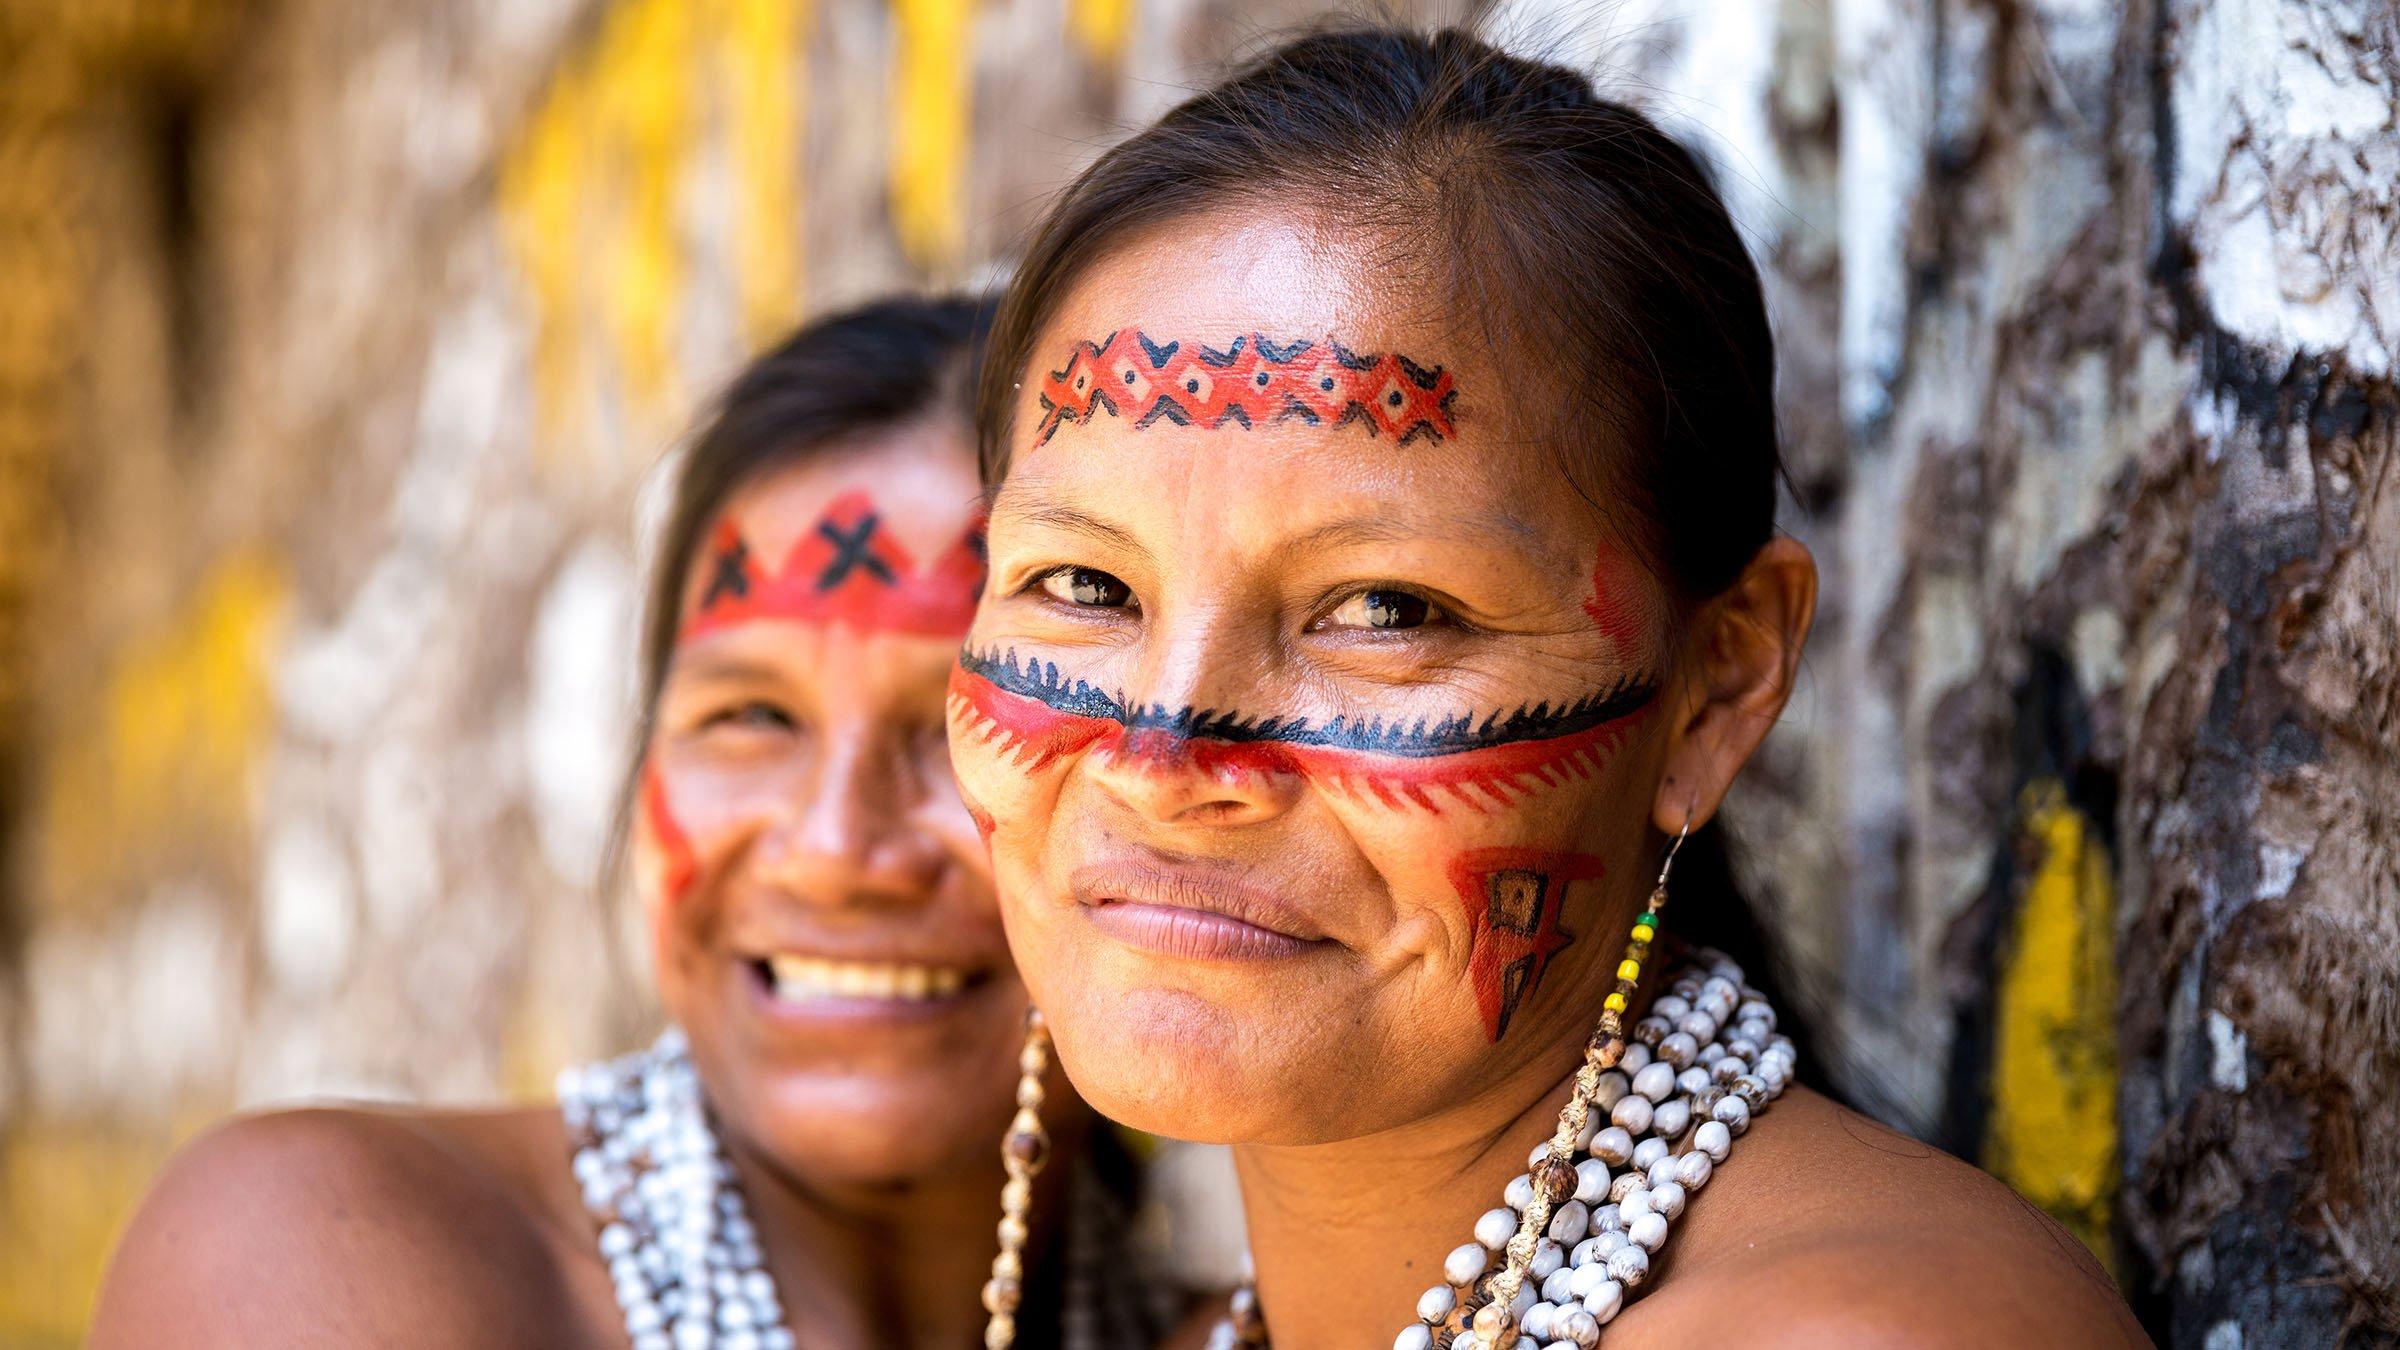 Tribus con dialectos brasilenos